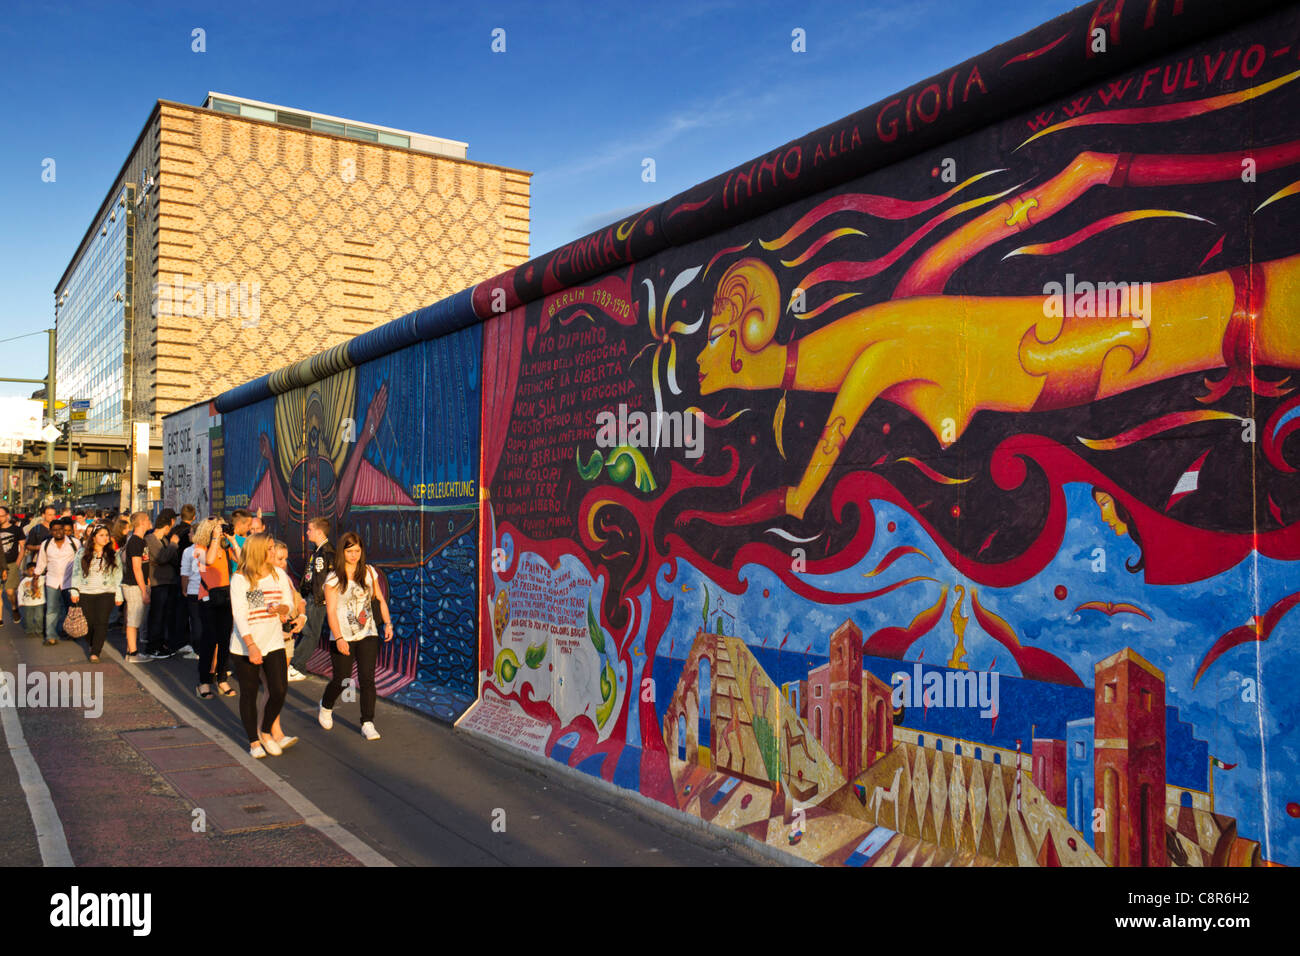 Berliner Mauer Wandbild, East Side Gallery, Berlin, Deutschland Stockbild